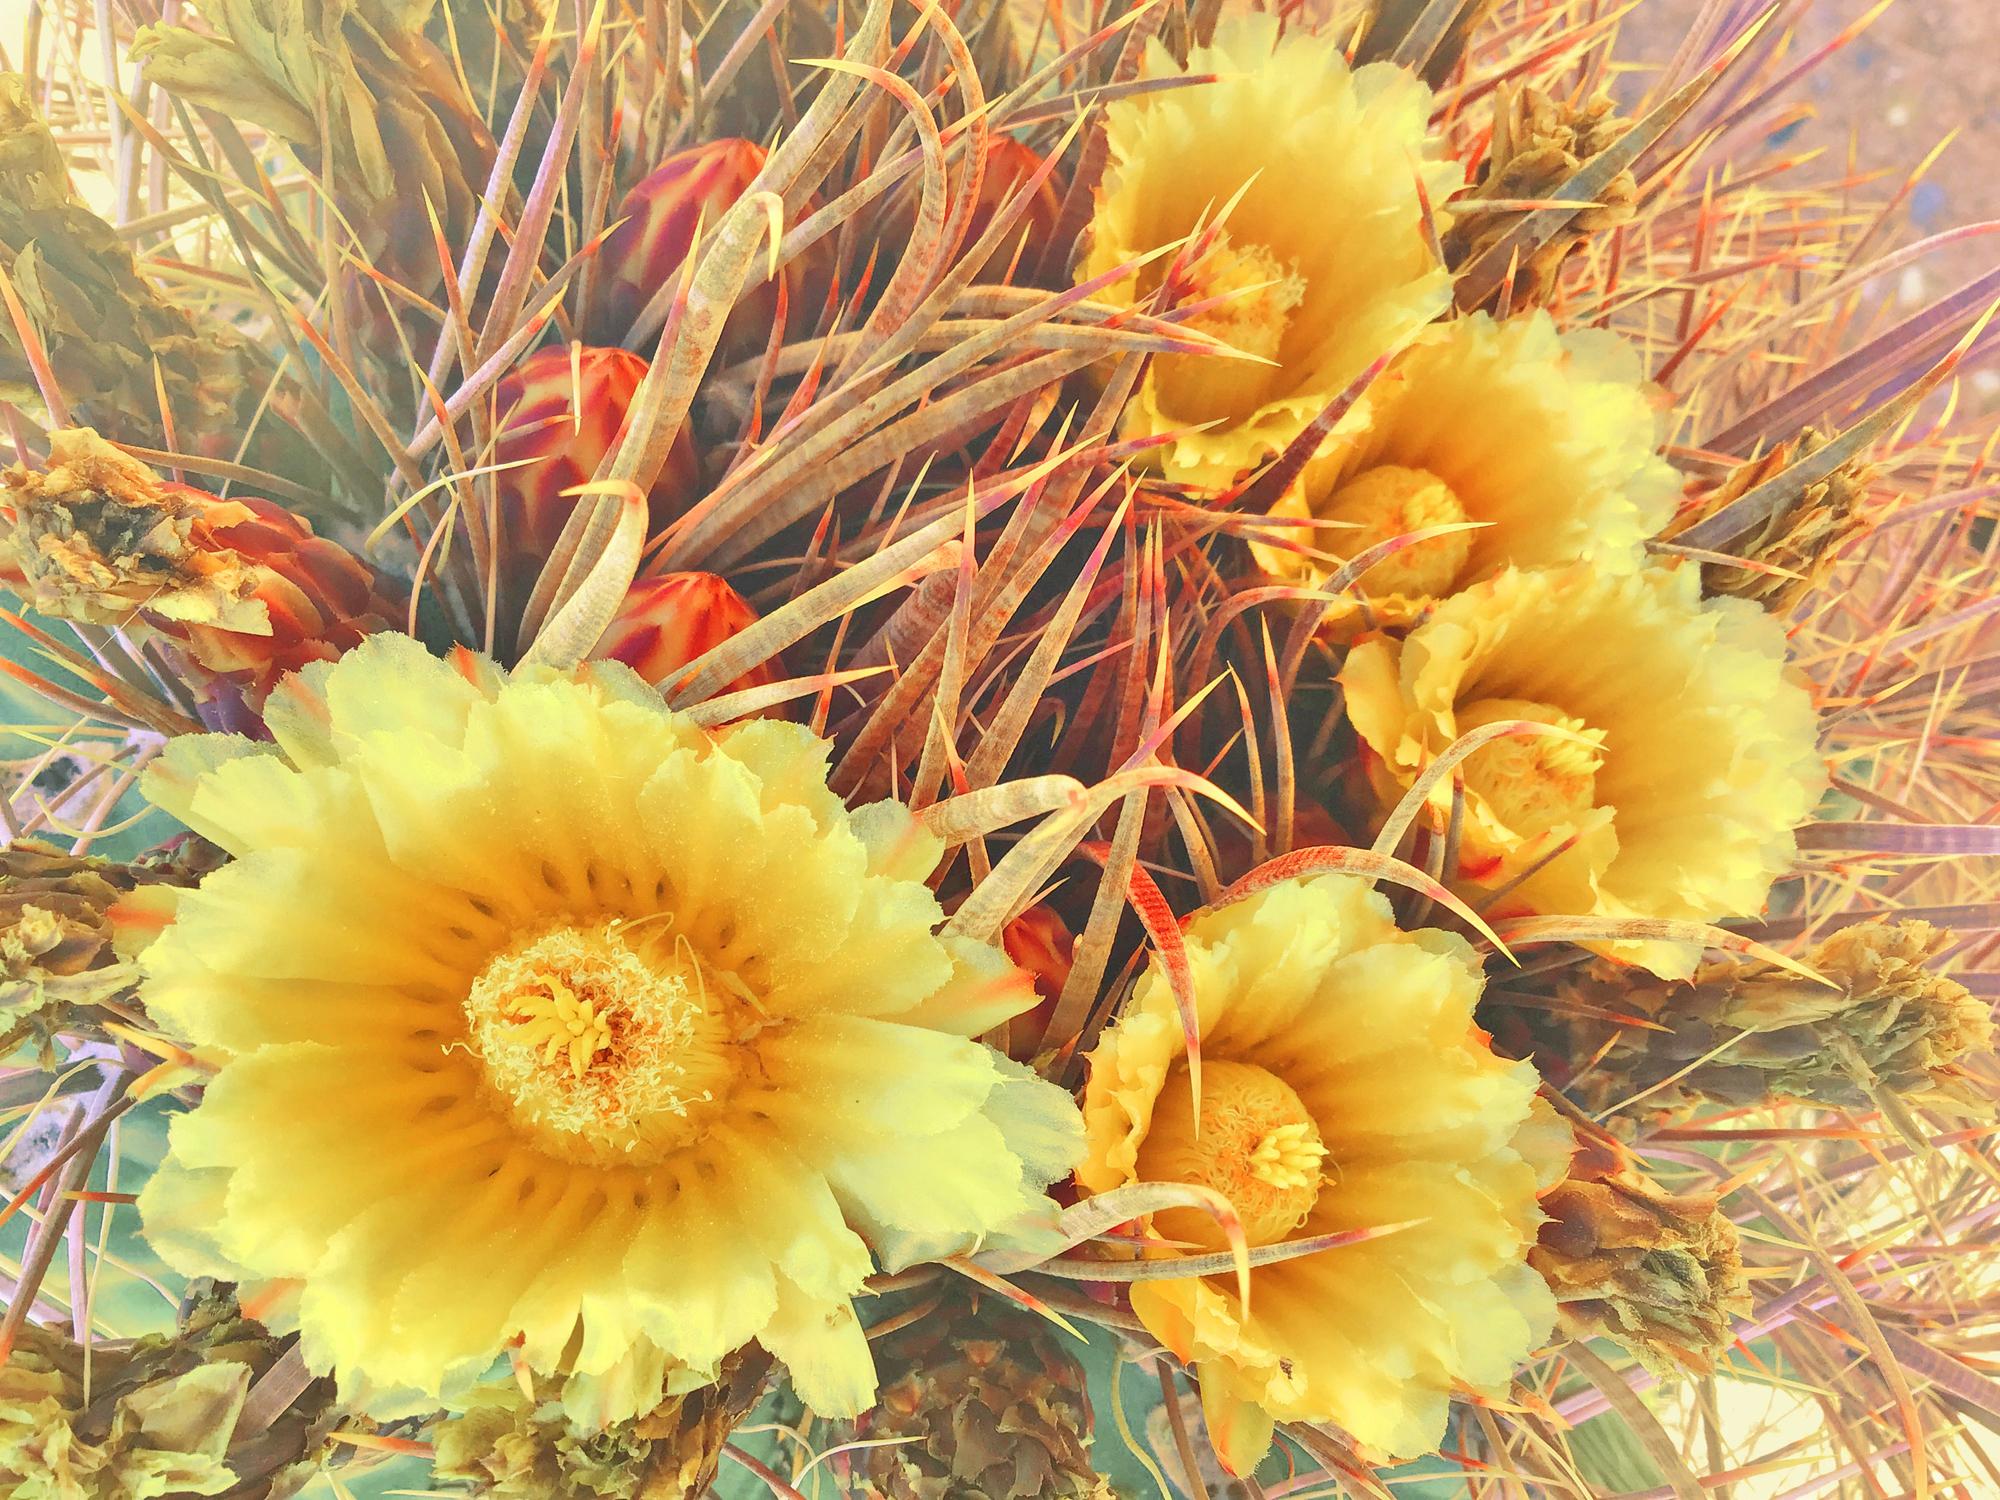 Warm Yellow Barrel Cactus Flowers